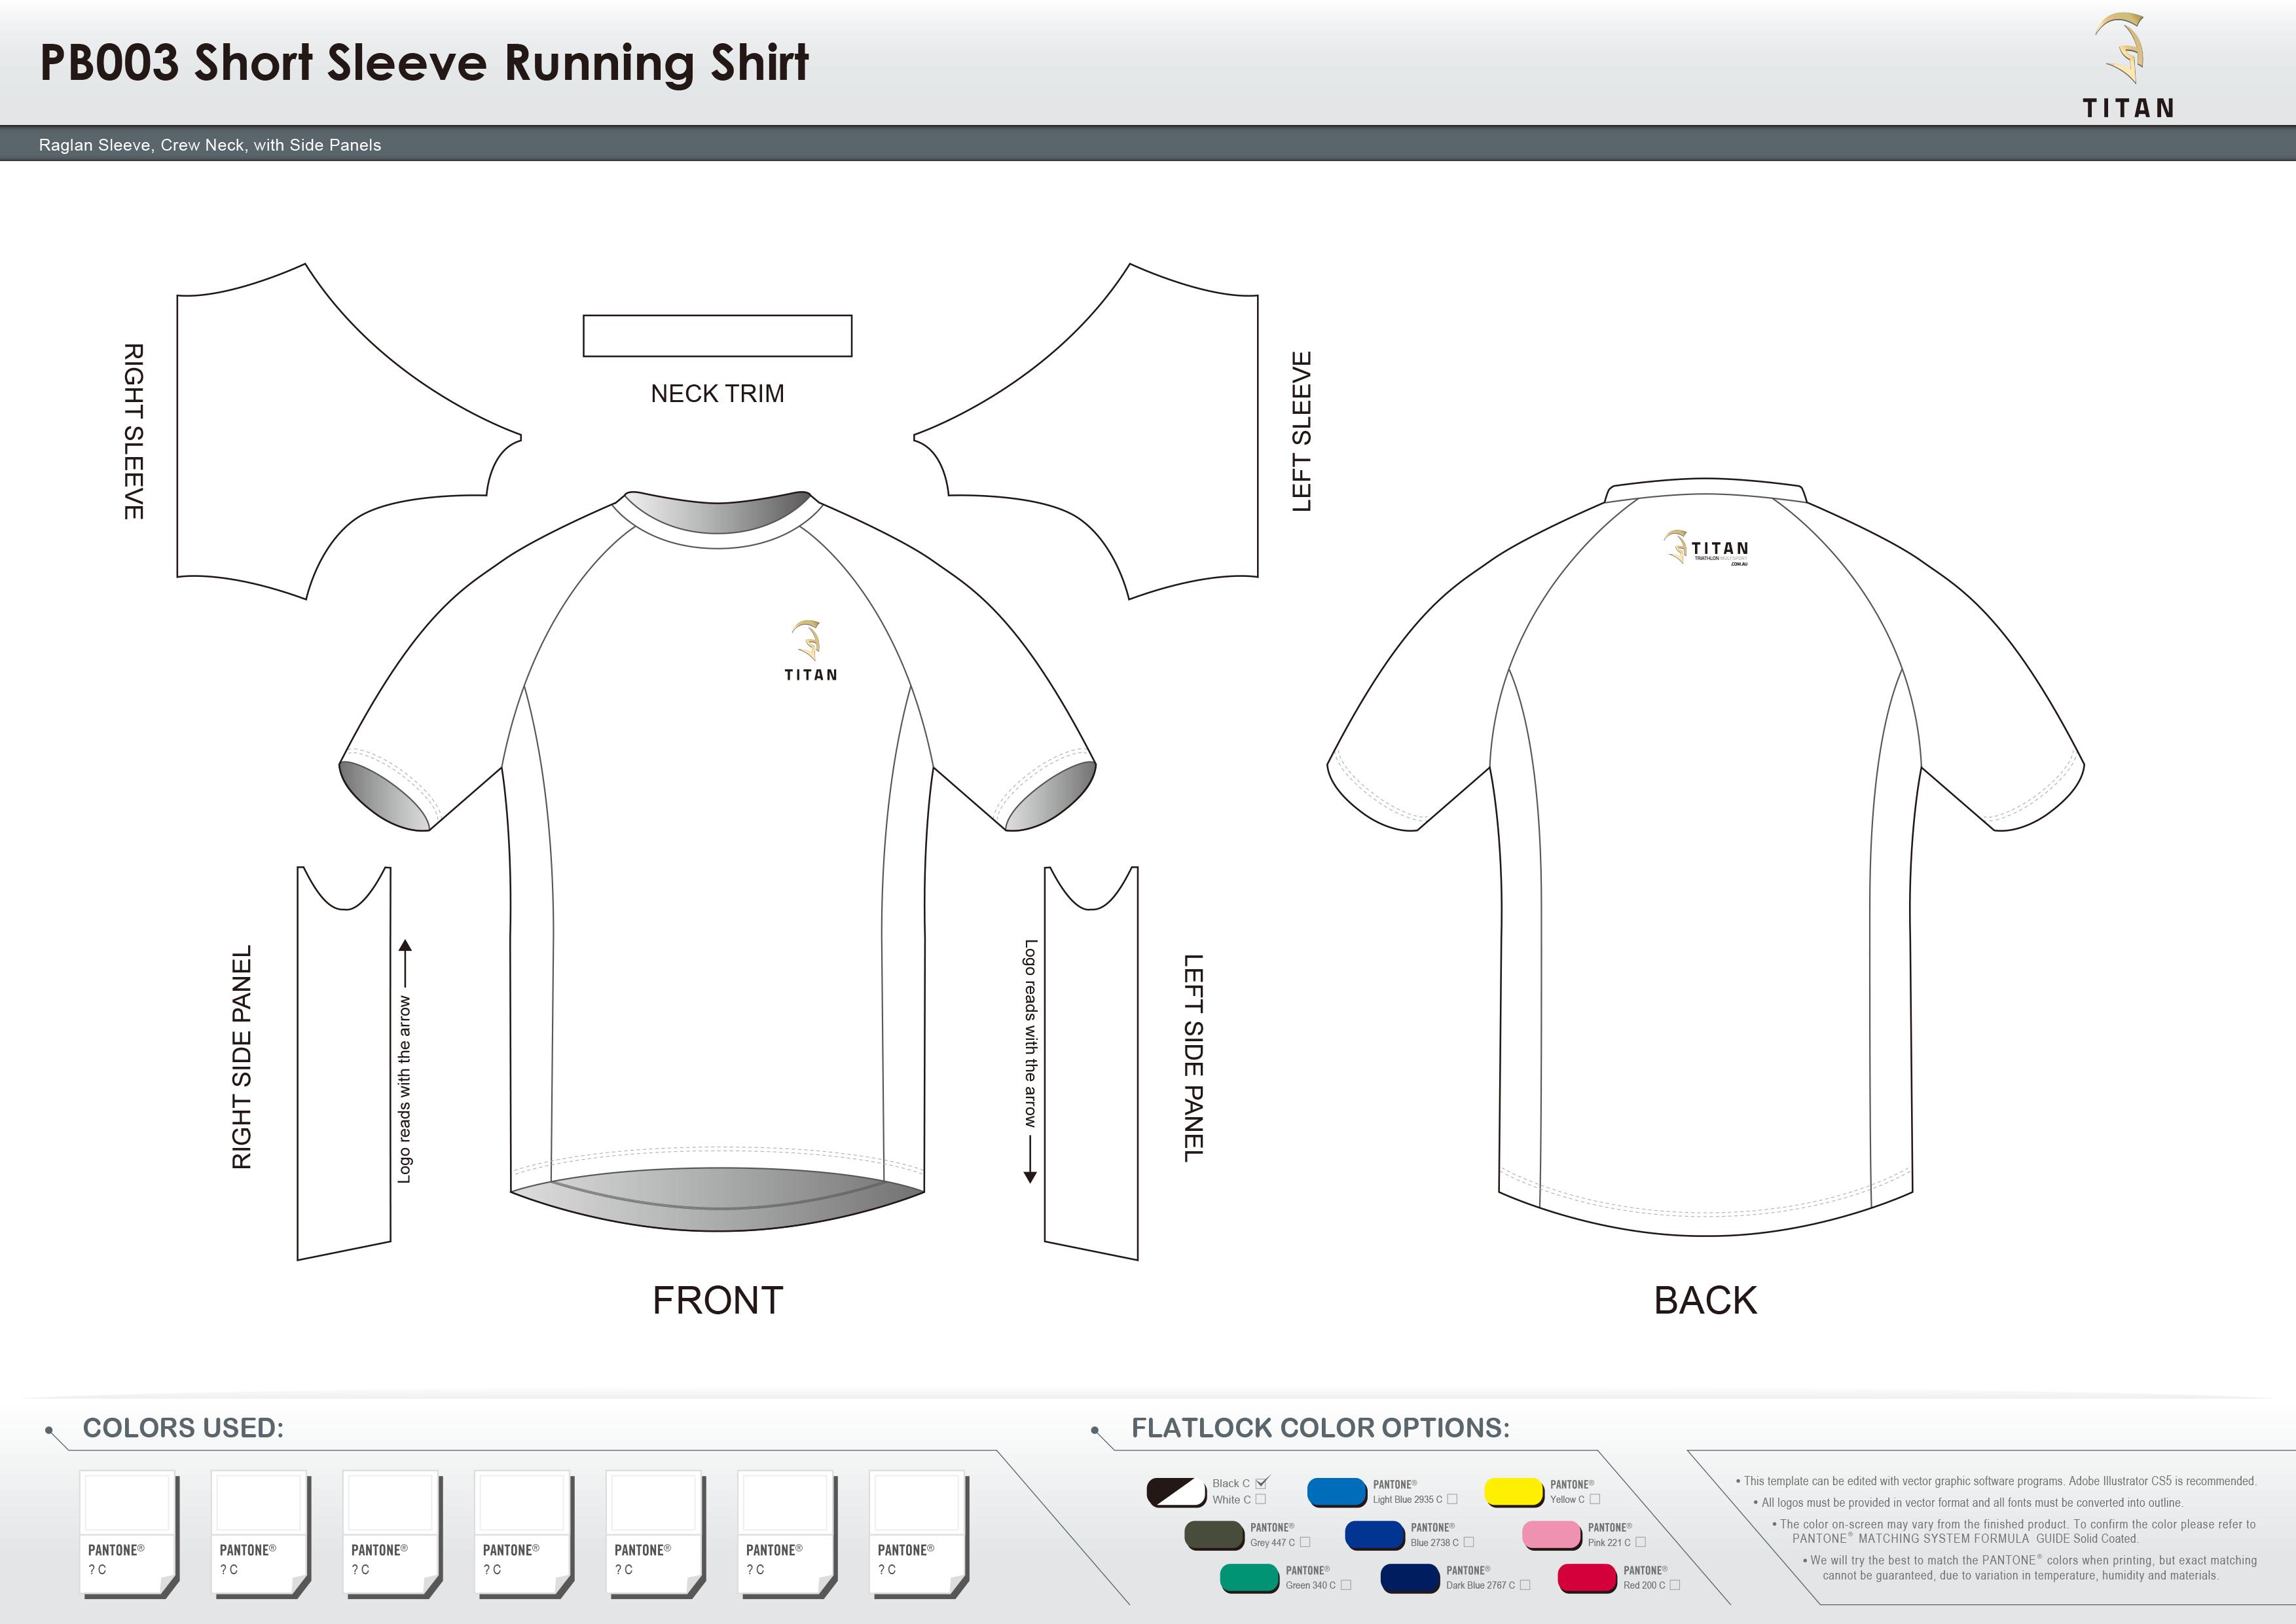 PB003 Short Sleeve Running Shirt